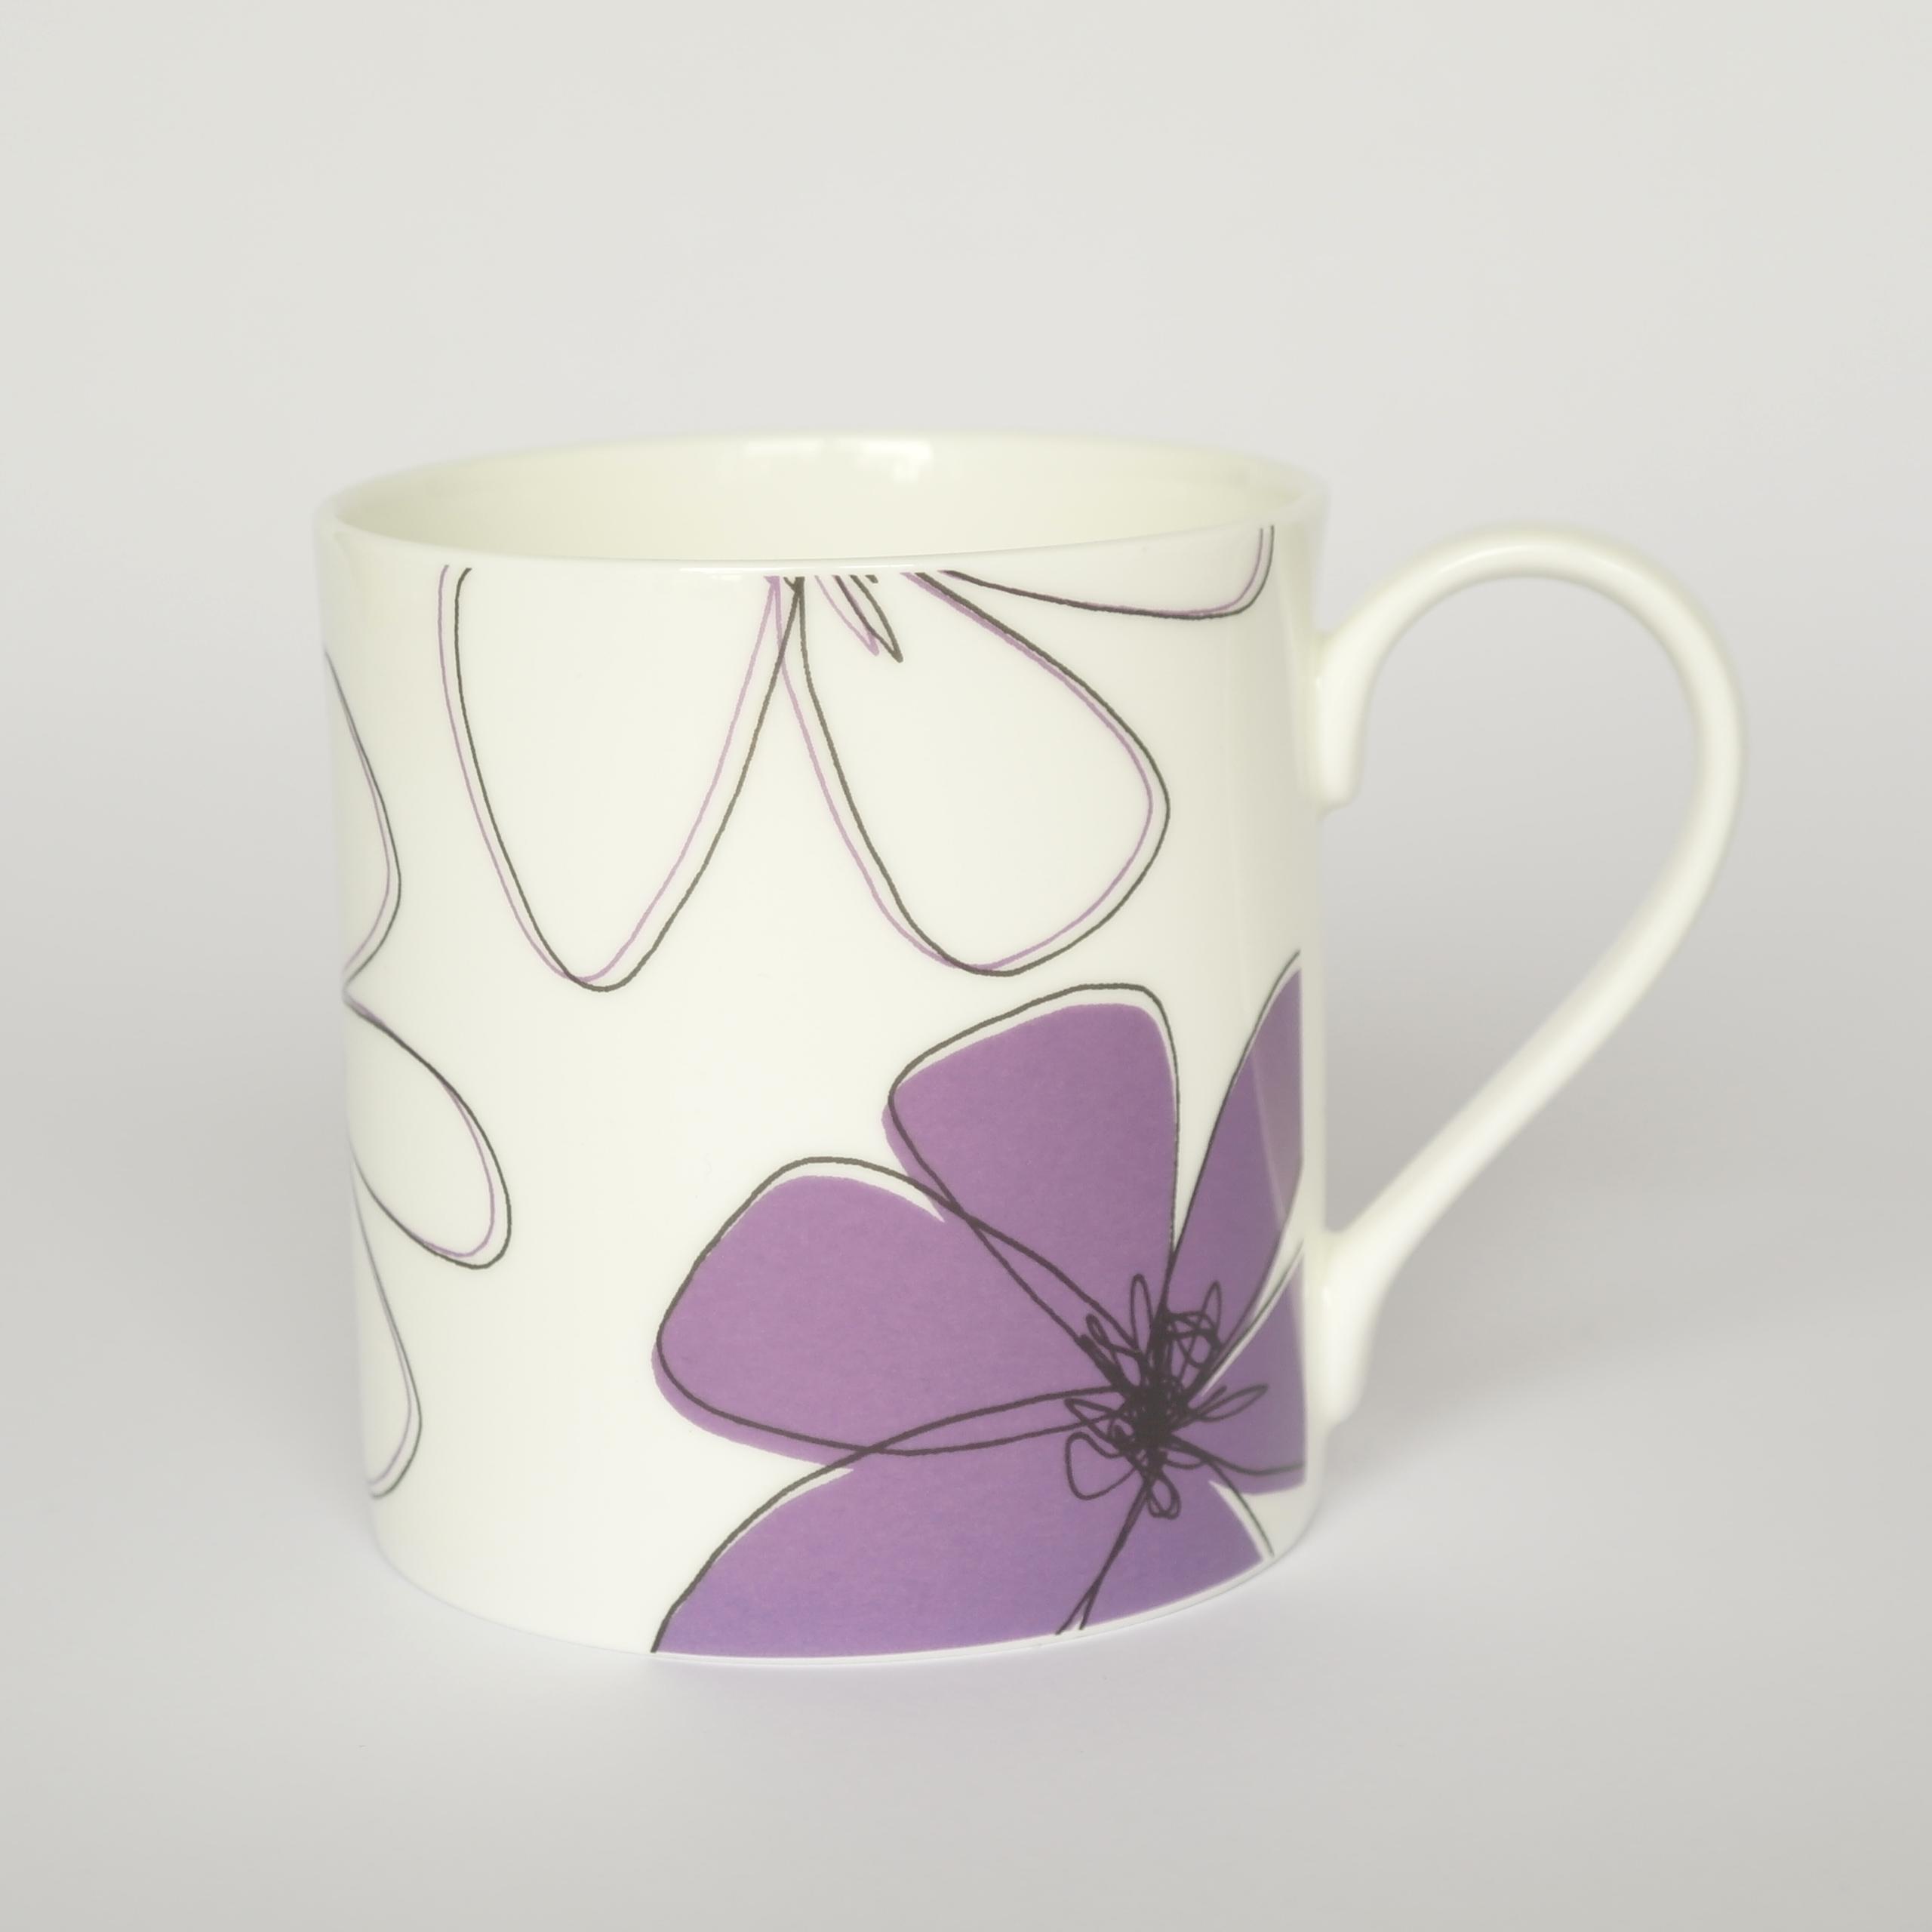 Daisy Open Mug Boxed (English Fine Bone China) Available in 6 Colourways